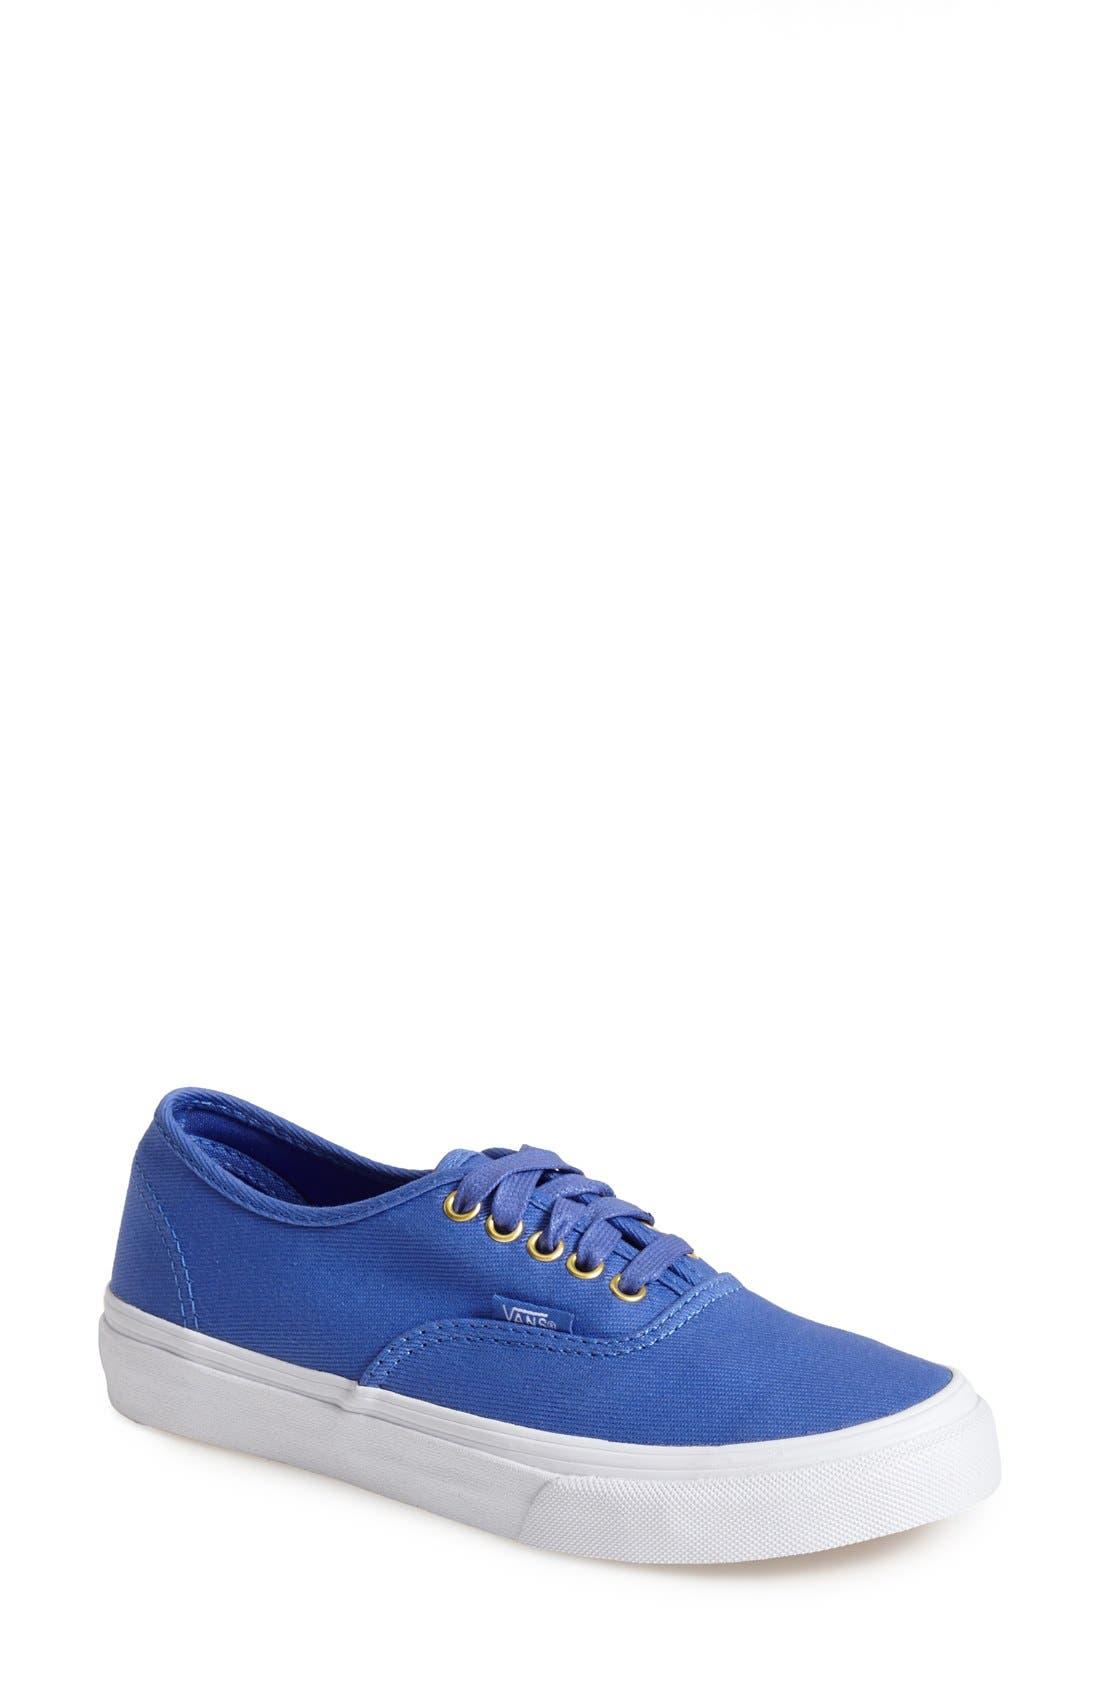 Main Image - Vans 'Authentic Slim' Twill Sneaker (Women)